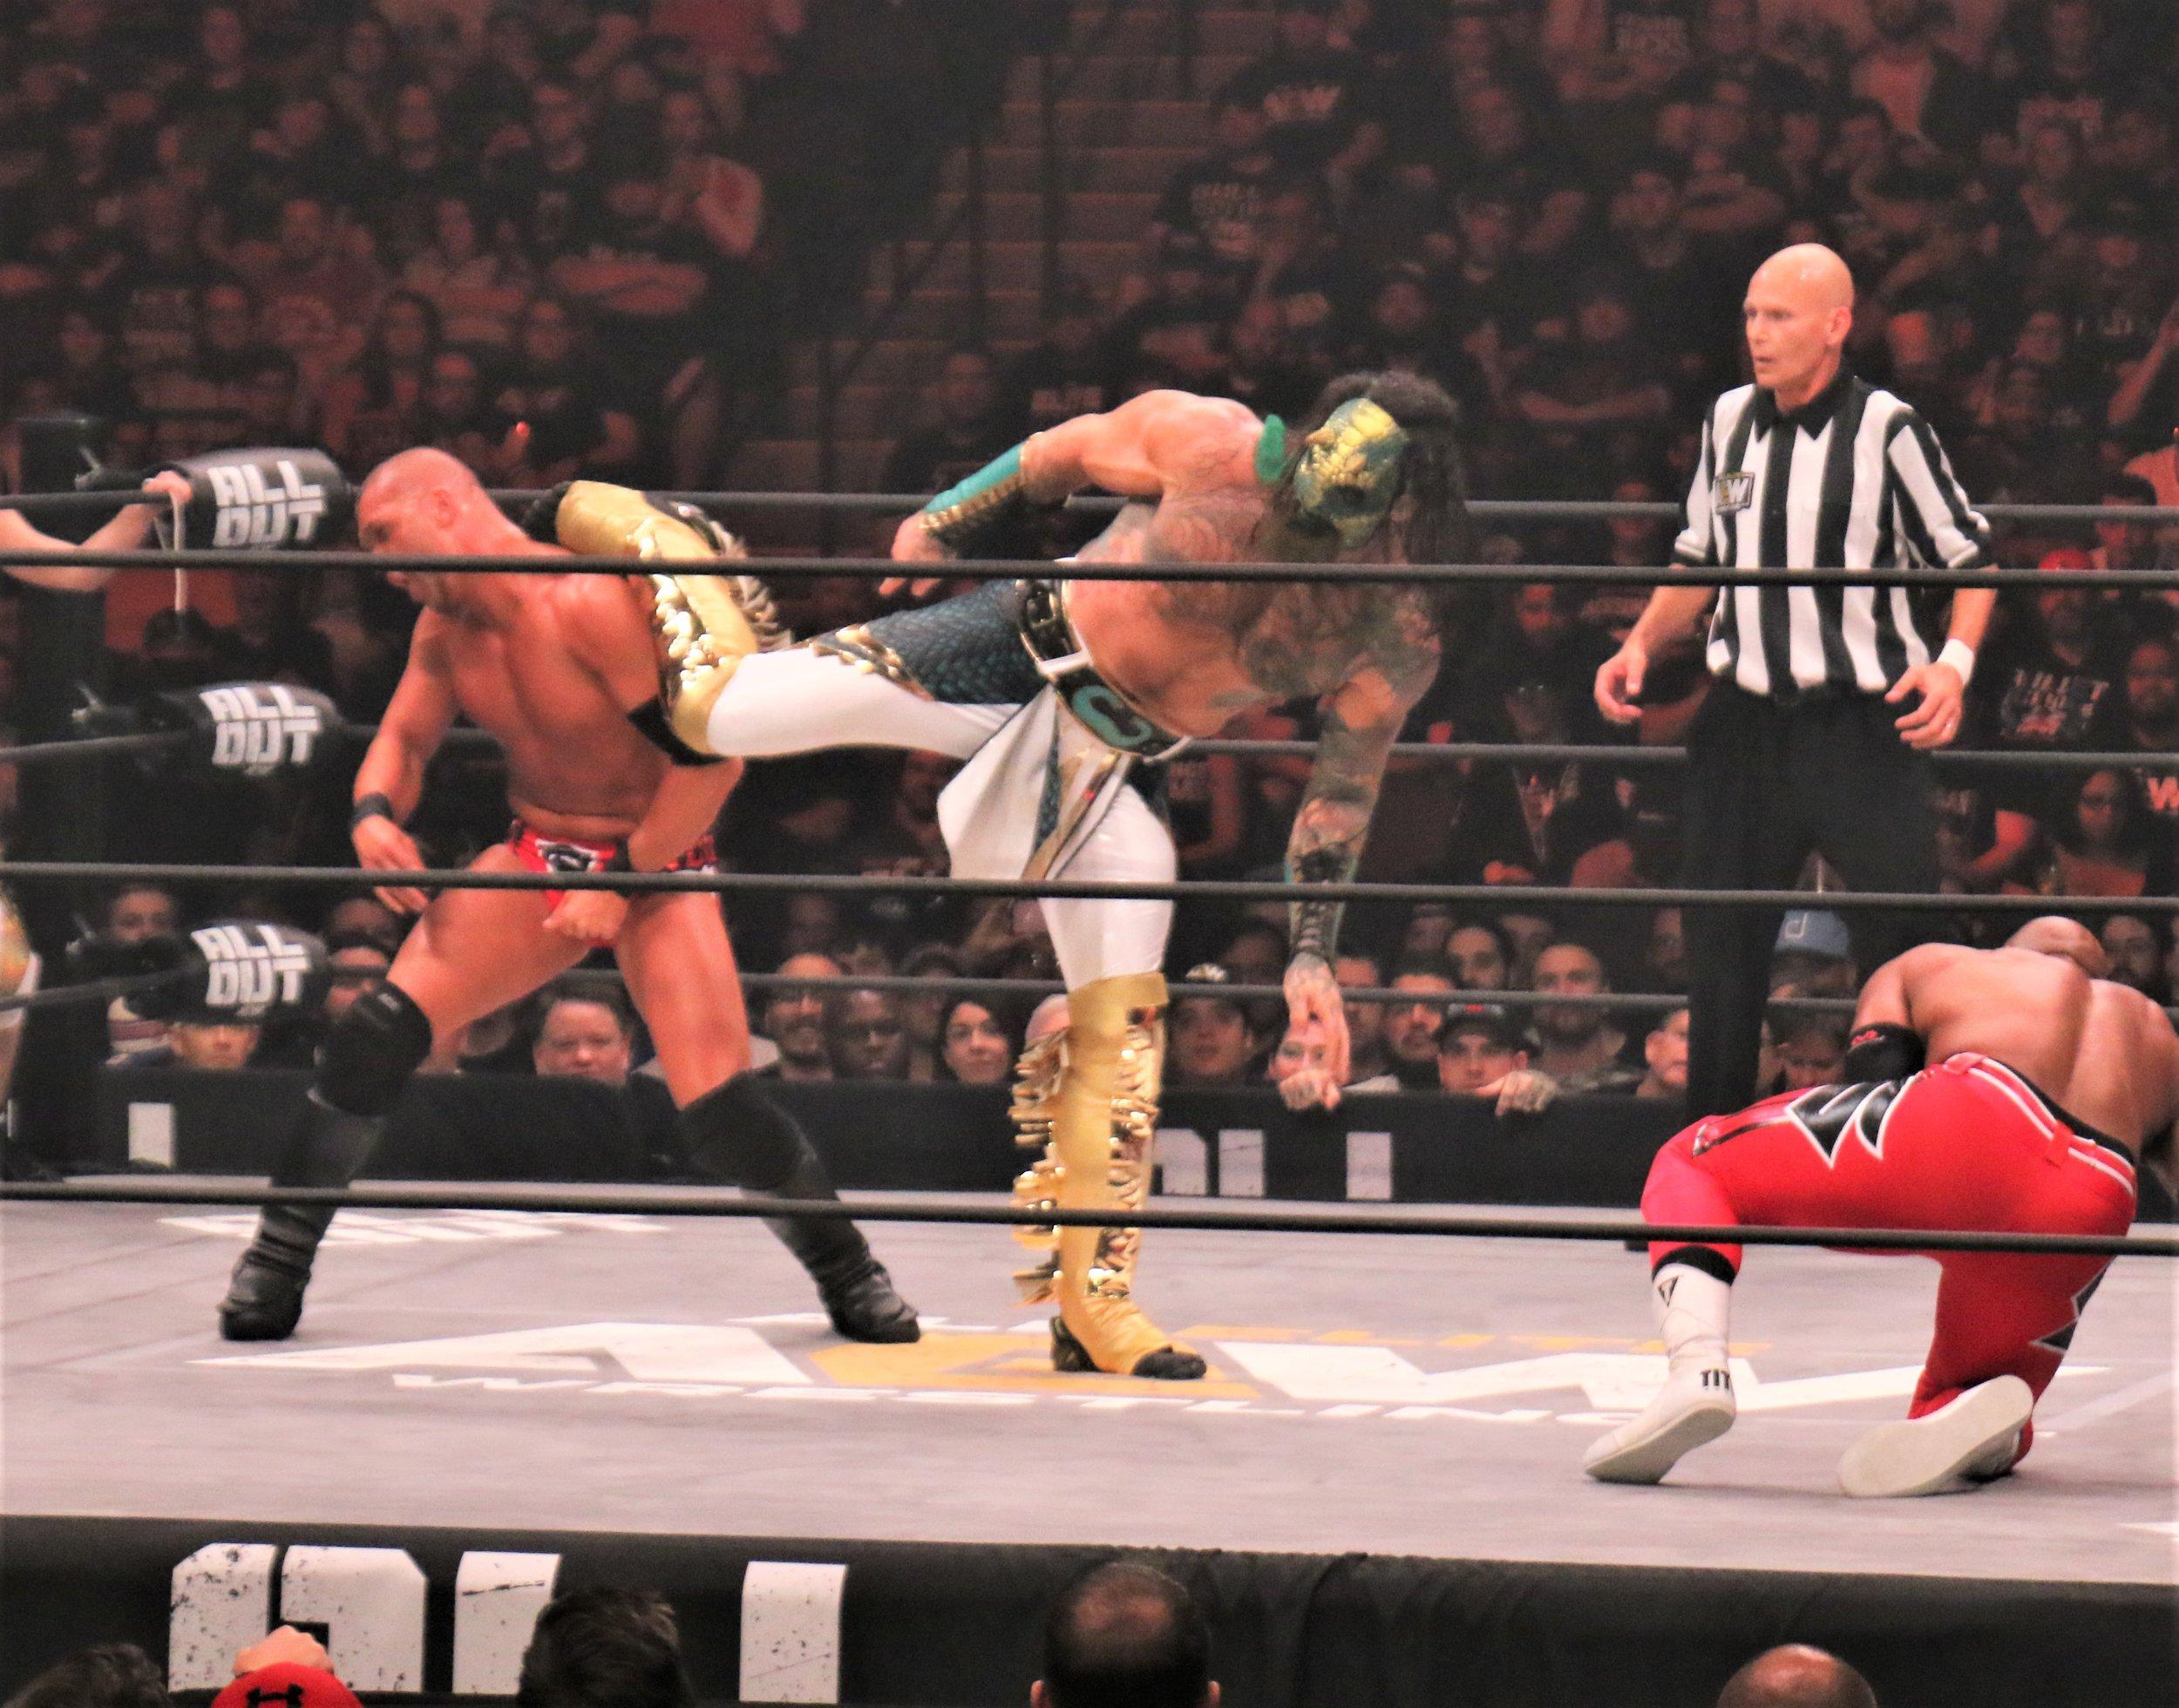 Luchasaurus kicks Frankie Kazarian in the head.